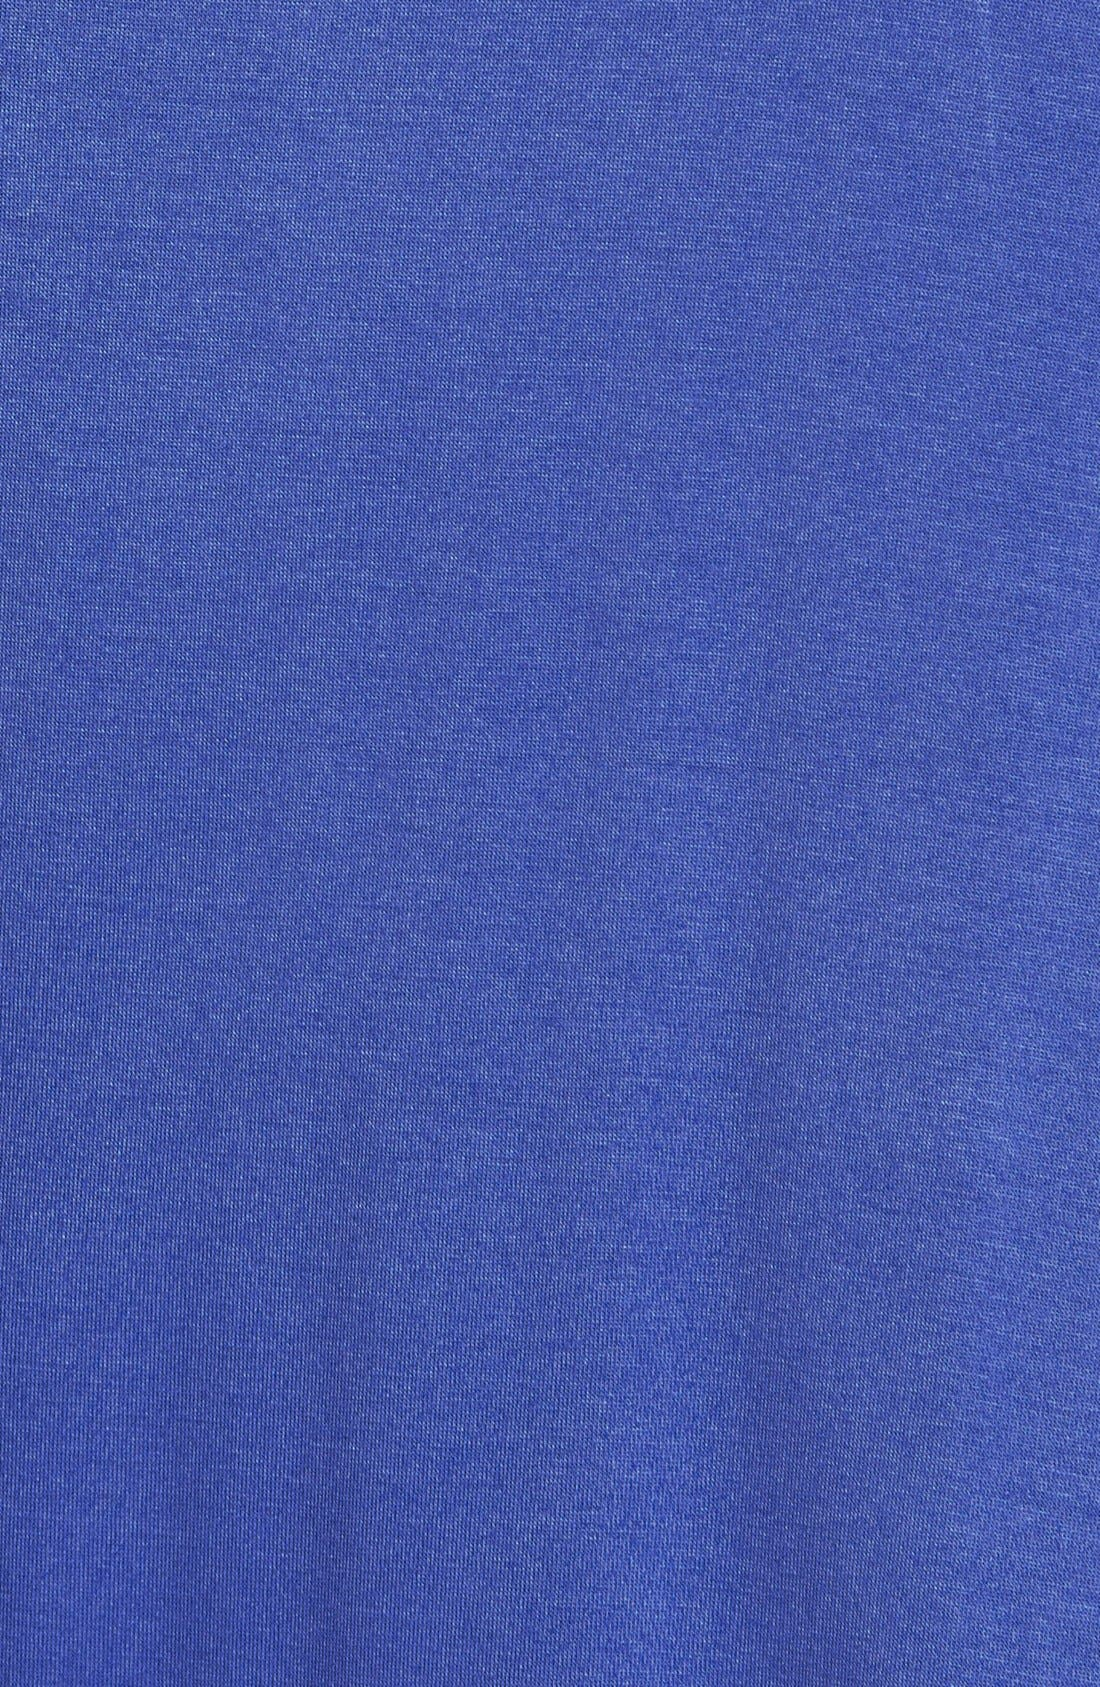 Asymmetric Knit Maxi Skirt,                             Alternate thumbnail 17, color,